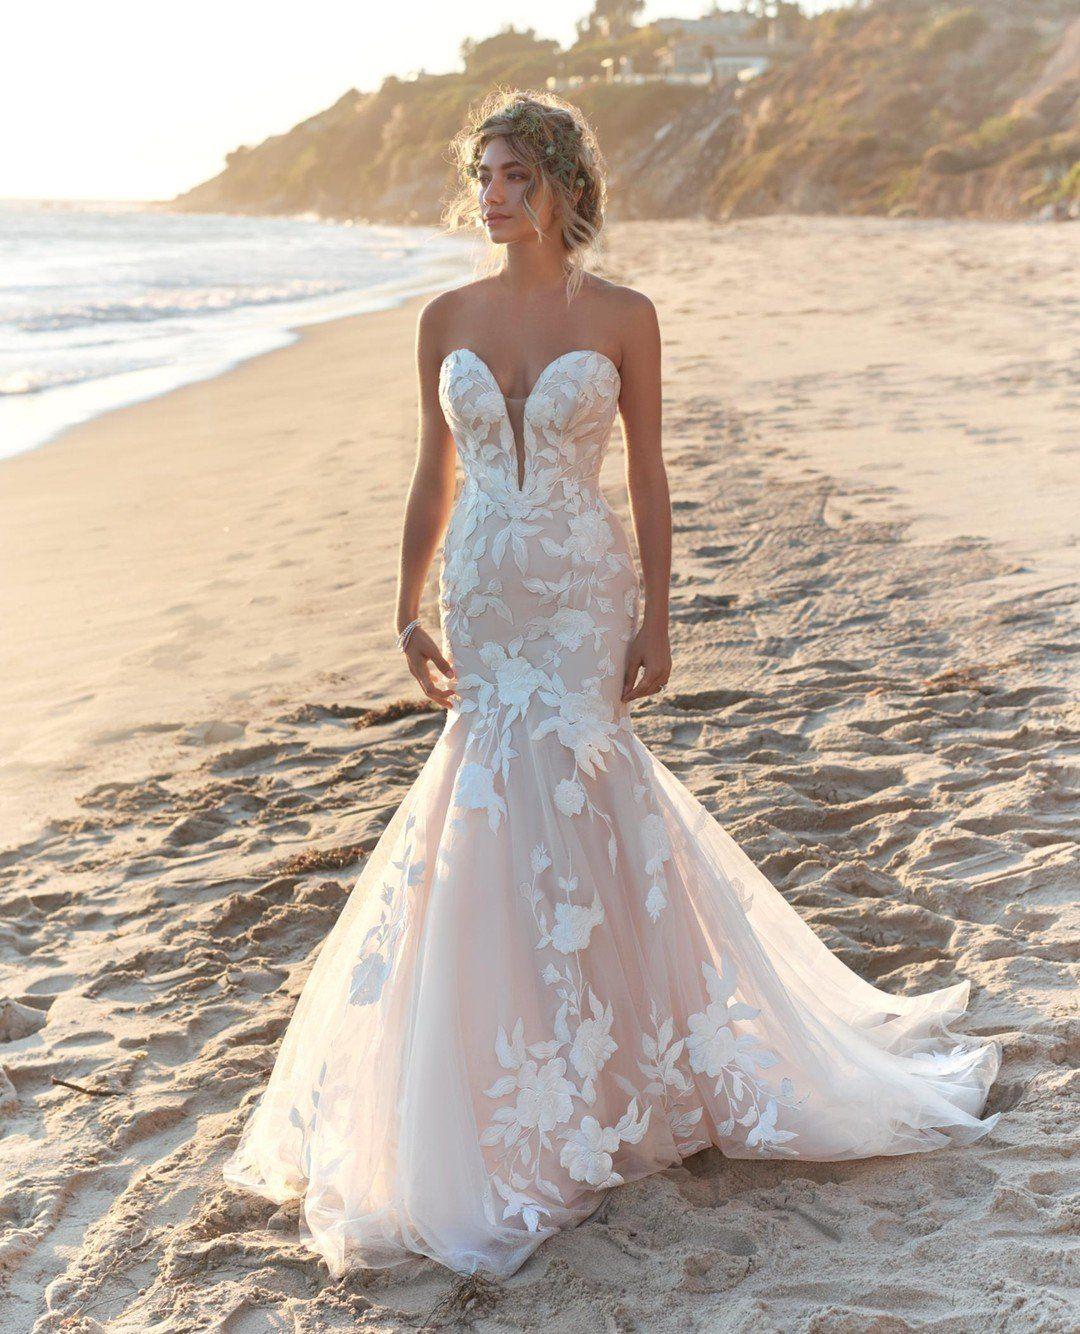 Boho beach wedding dresses MaggieSottero weddingdress ...